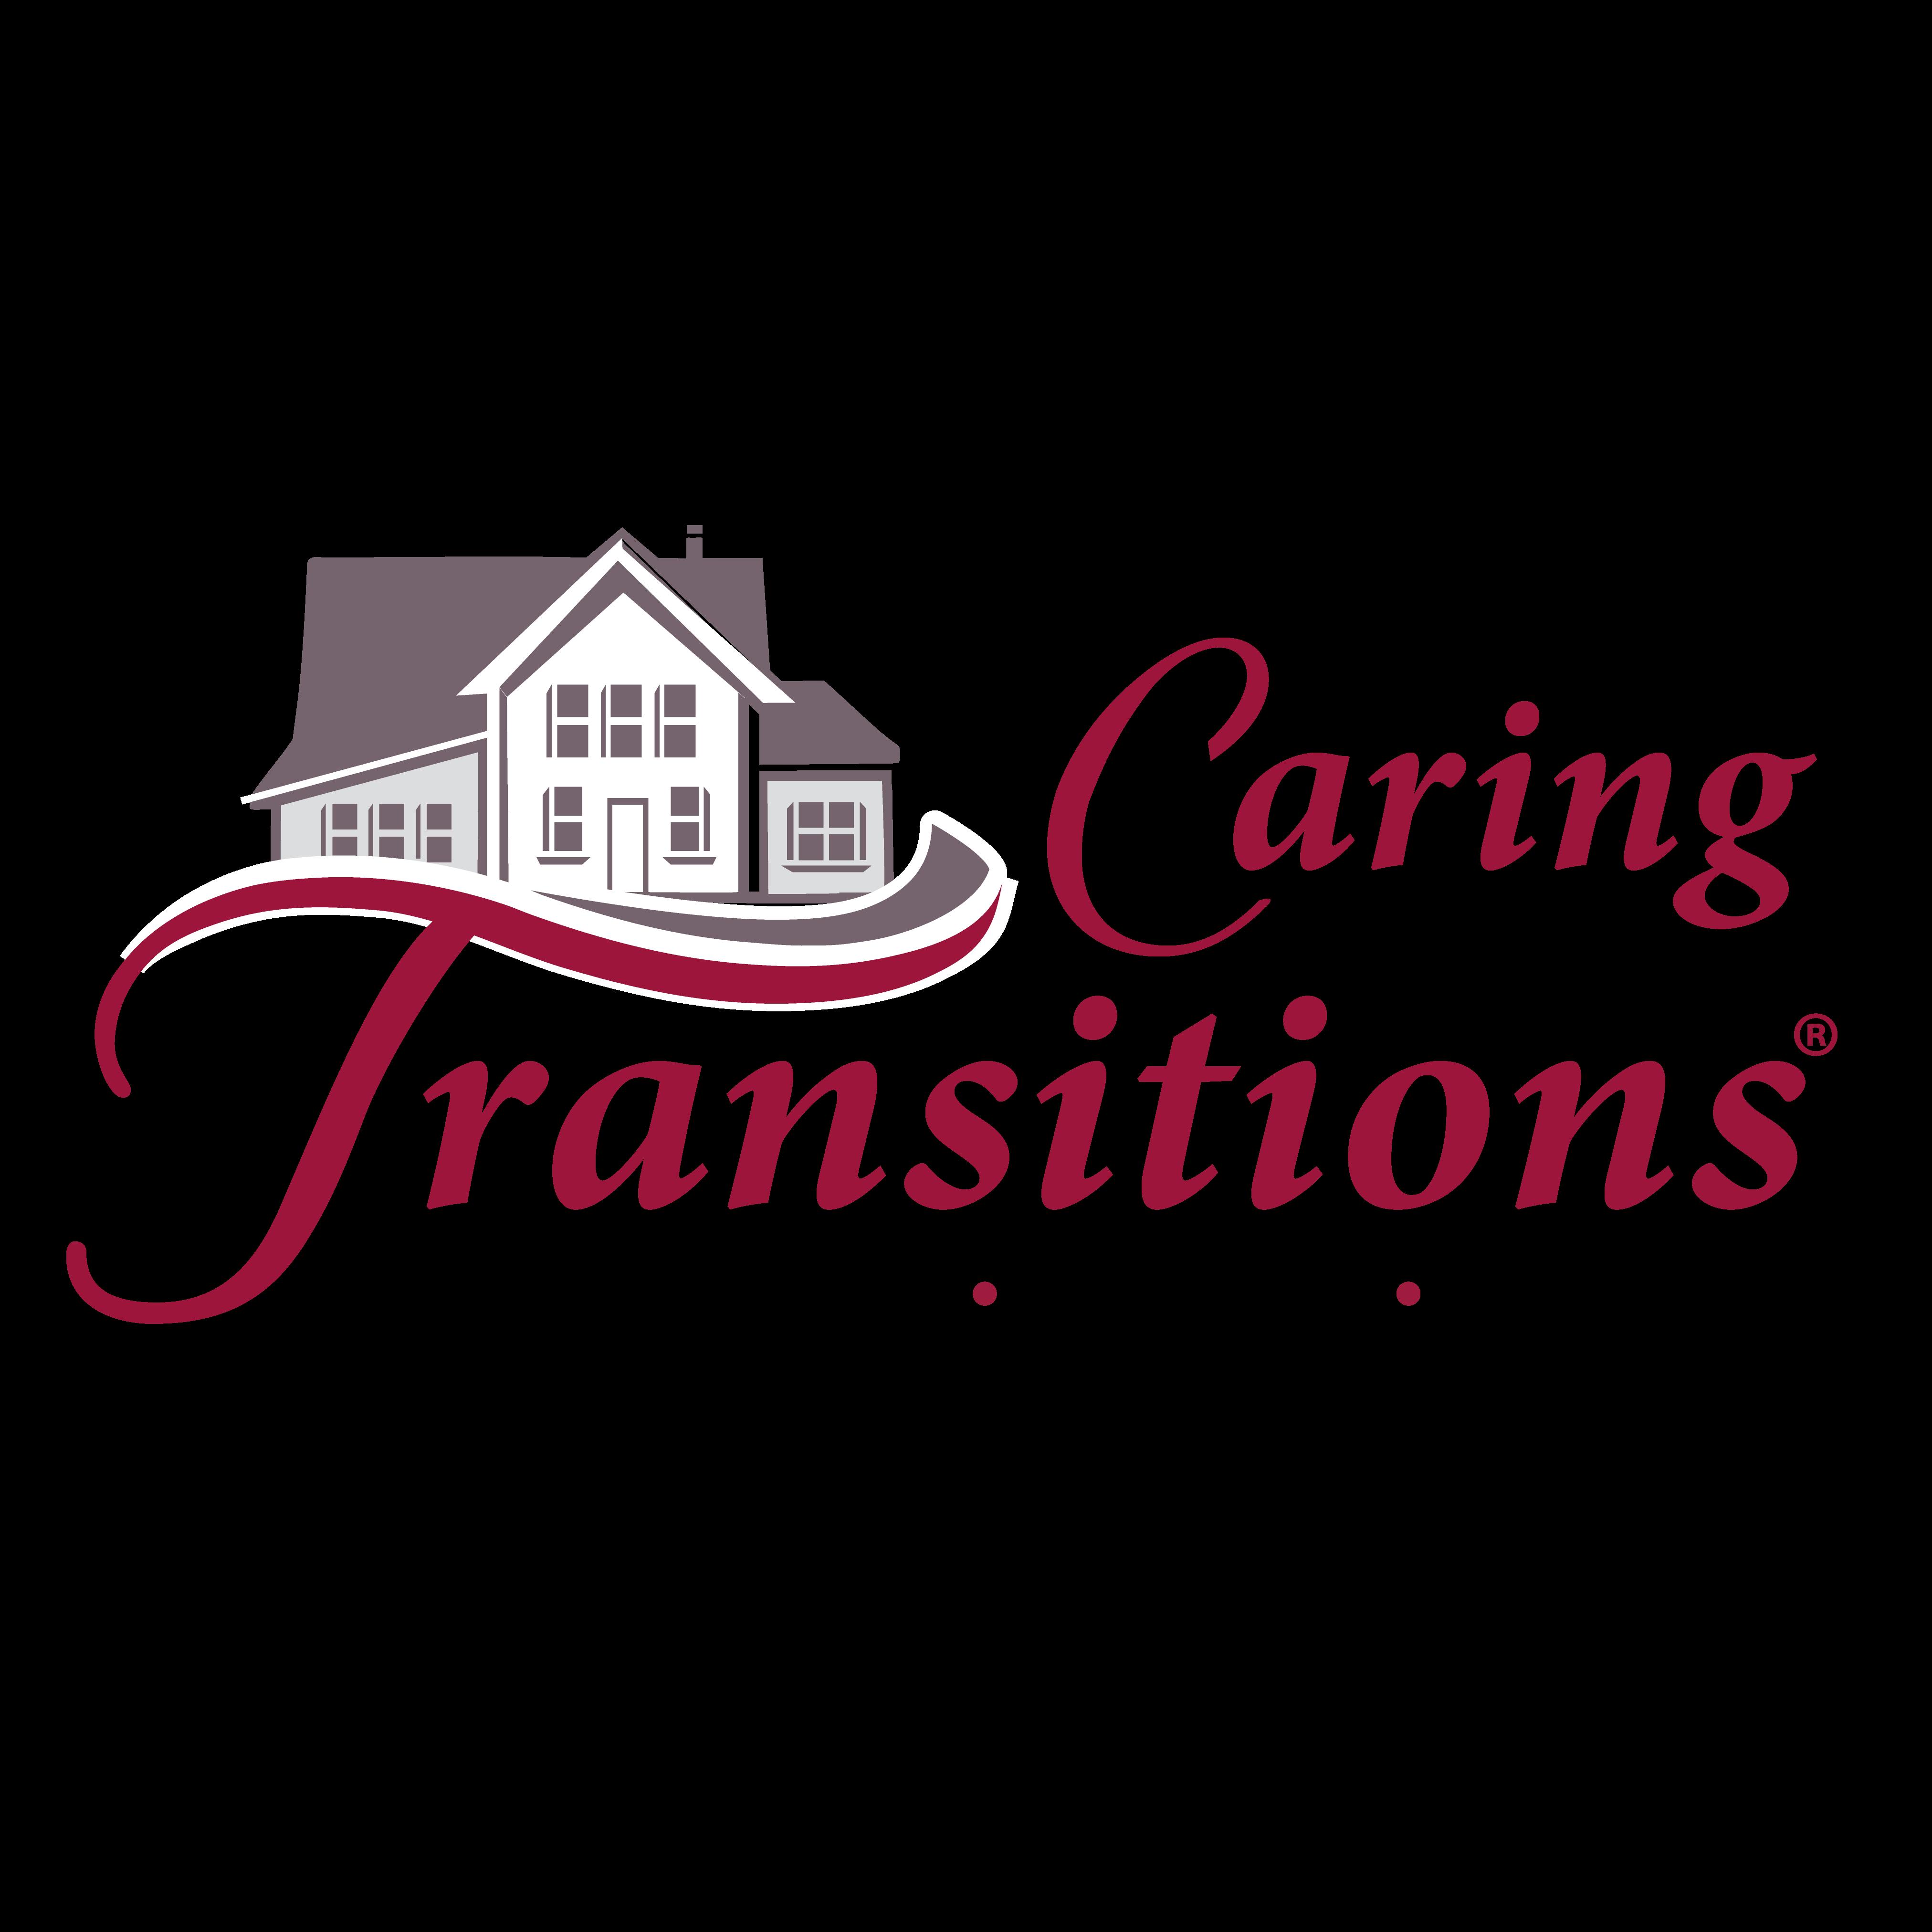 Caring Transitions of San Antonio